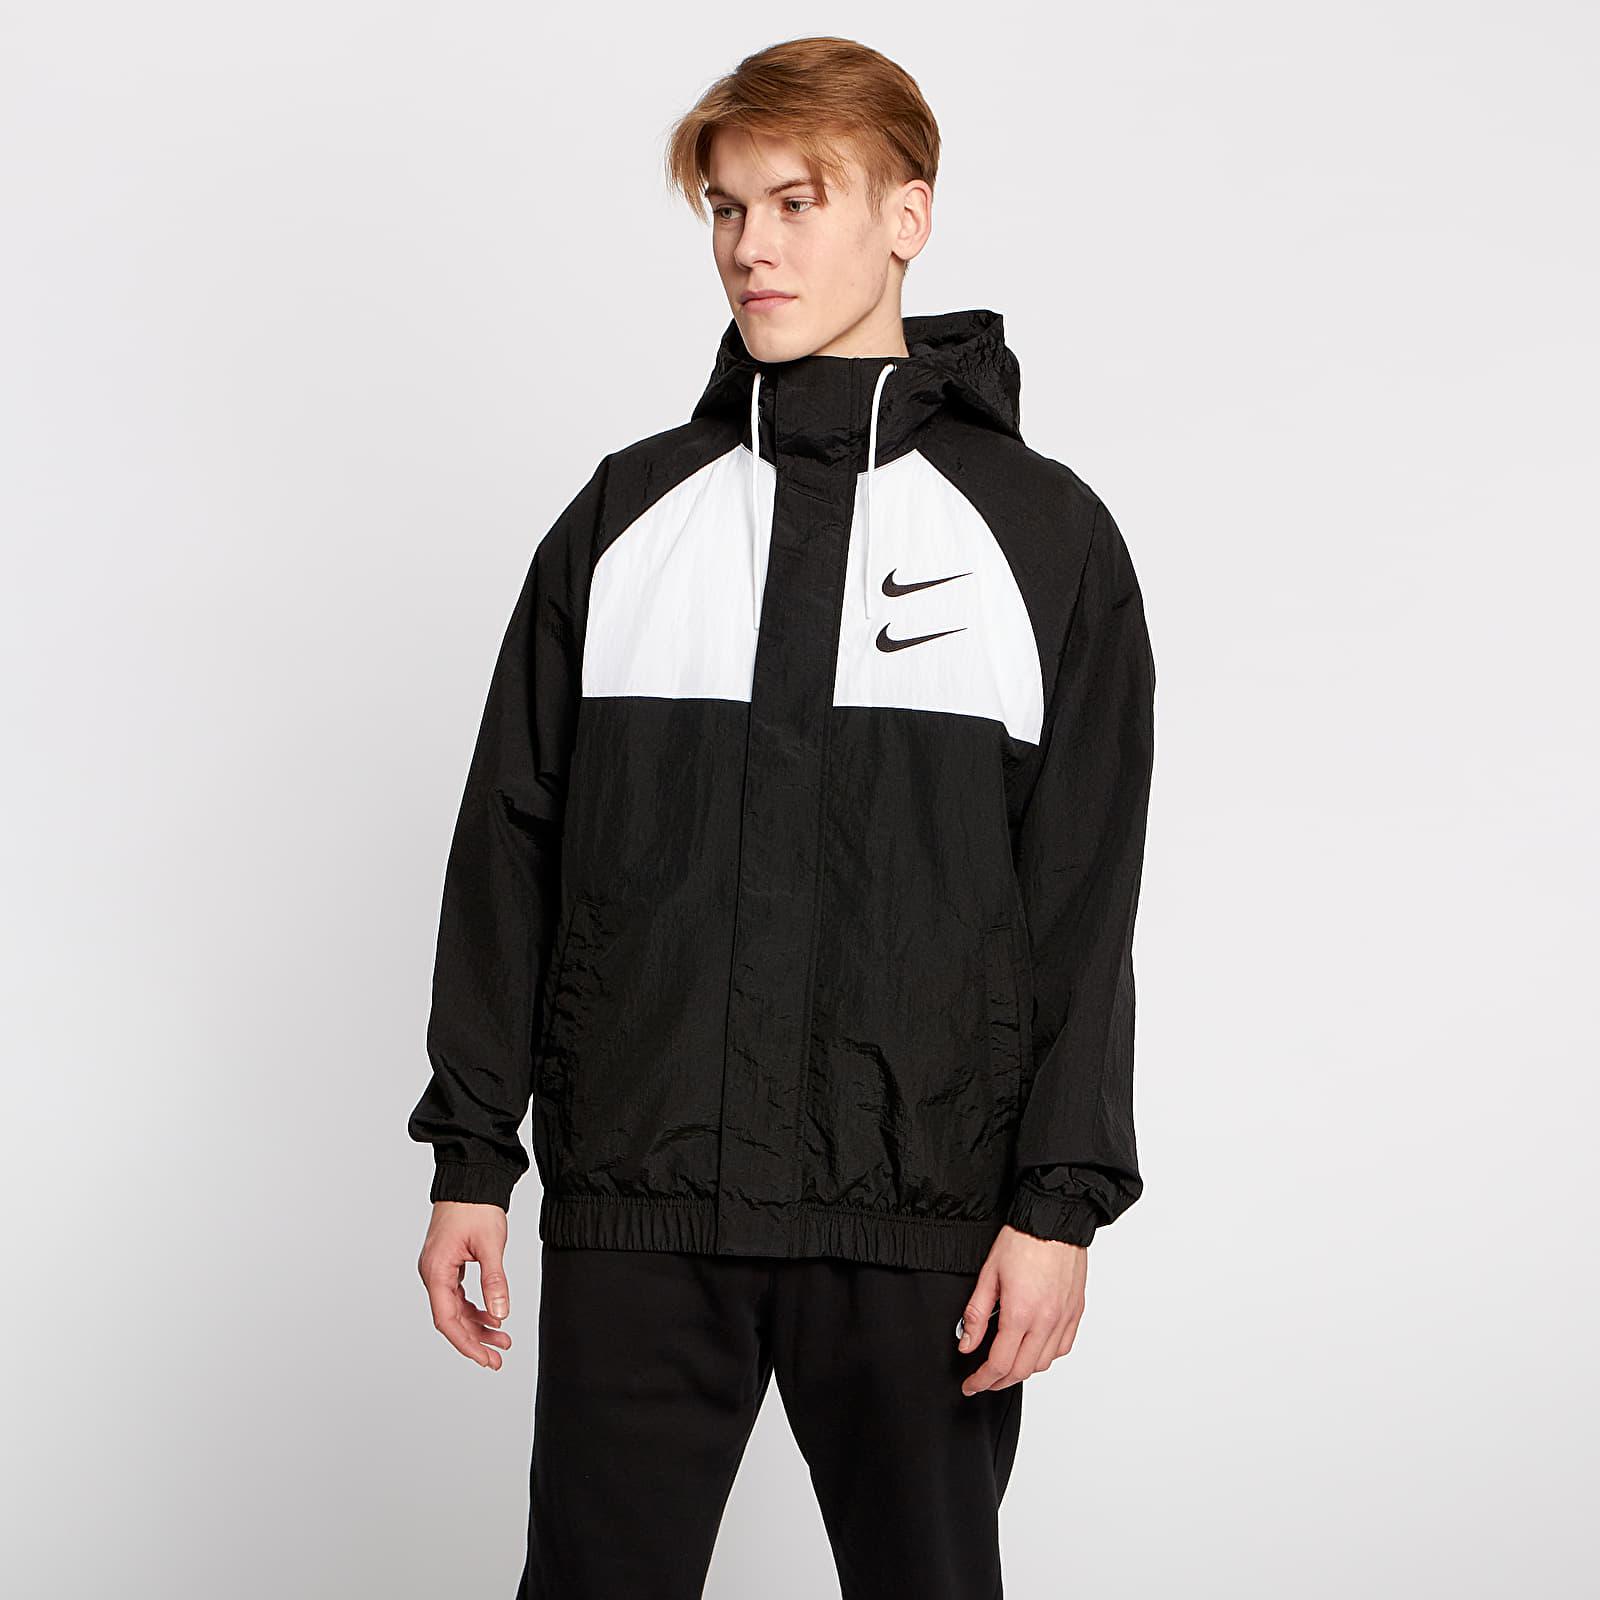 Nike Sportswear Swoosh Hooded Woven Jacket Black White Particle Grey Black | Footshop